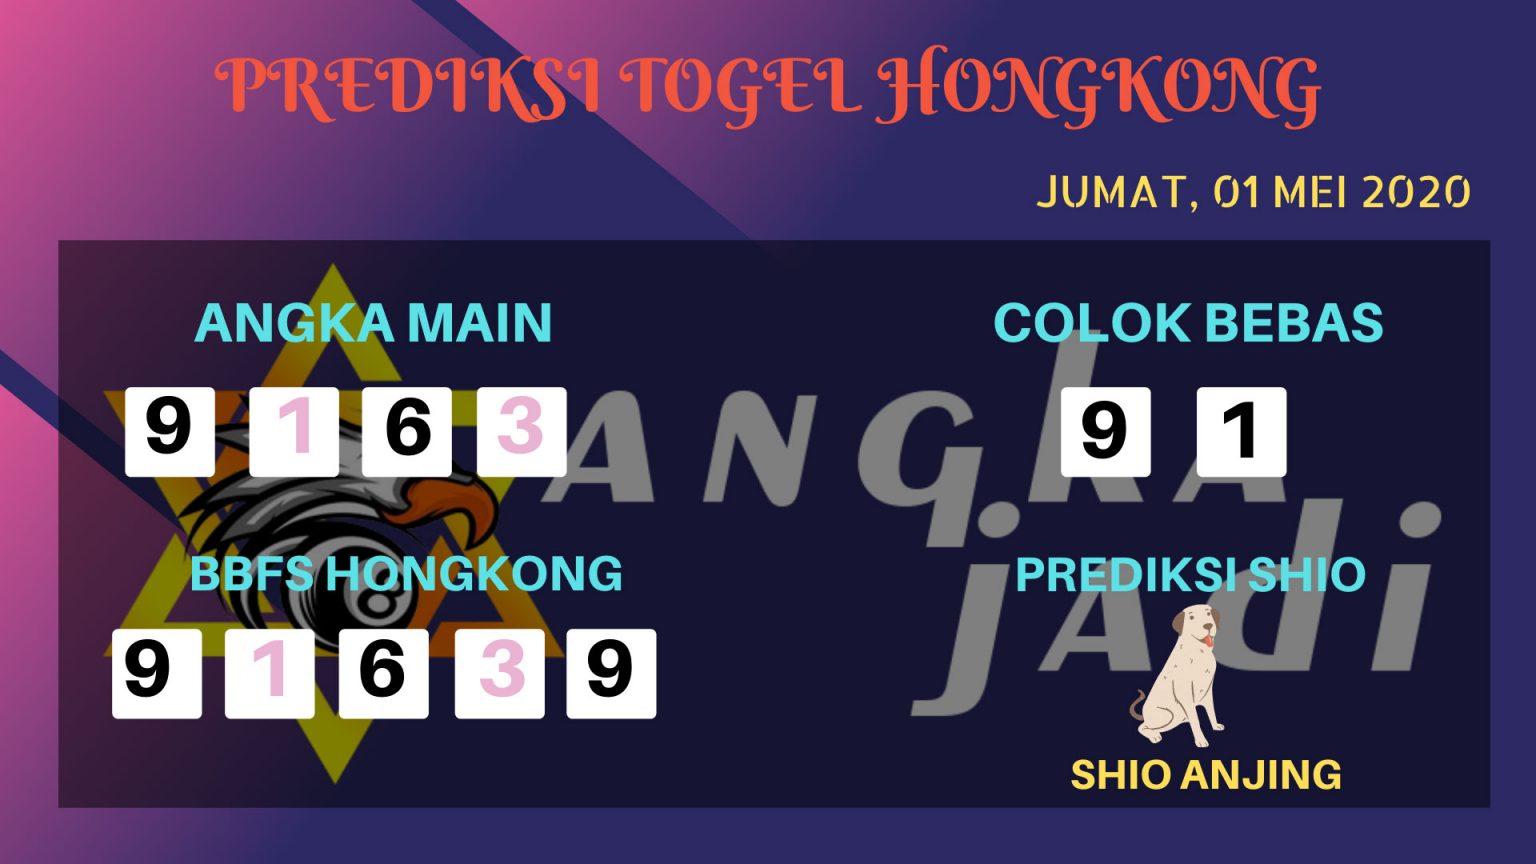 Prediksi HK 01 Mei 2020 - Prediksi Angka HK